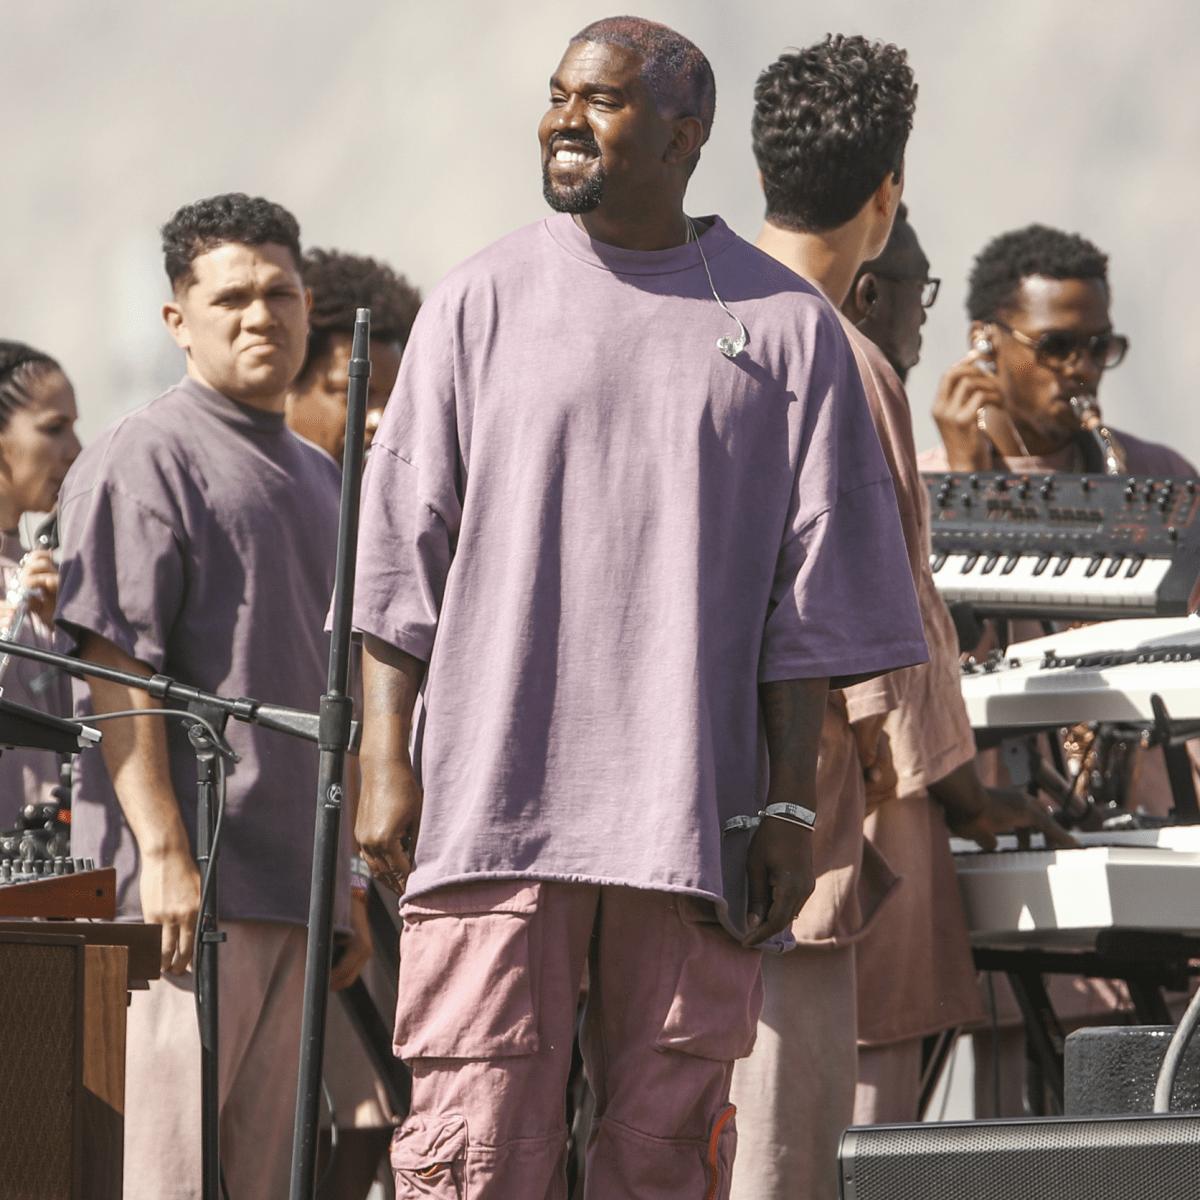 Kanye West Threw an On-Brand Sunday